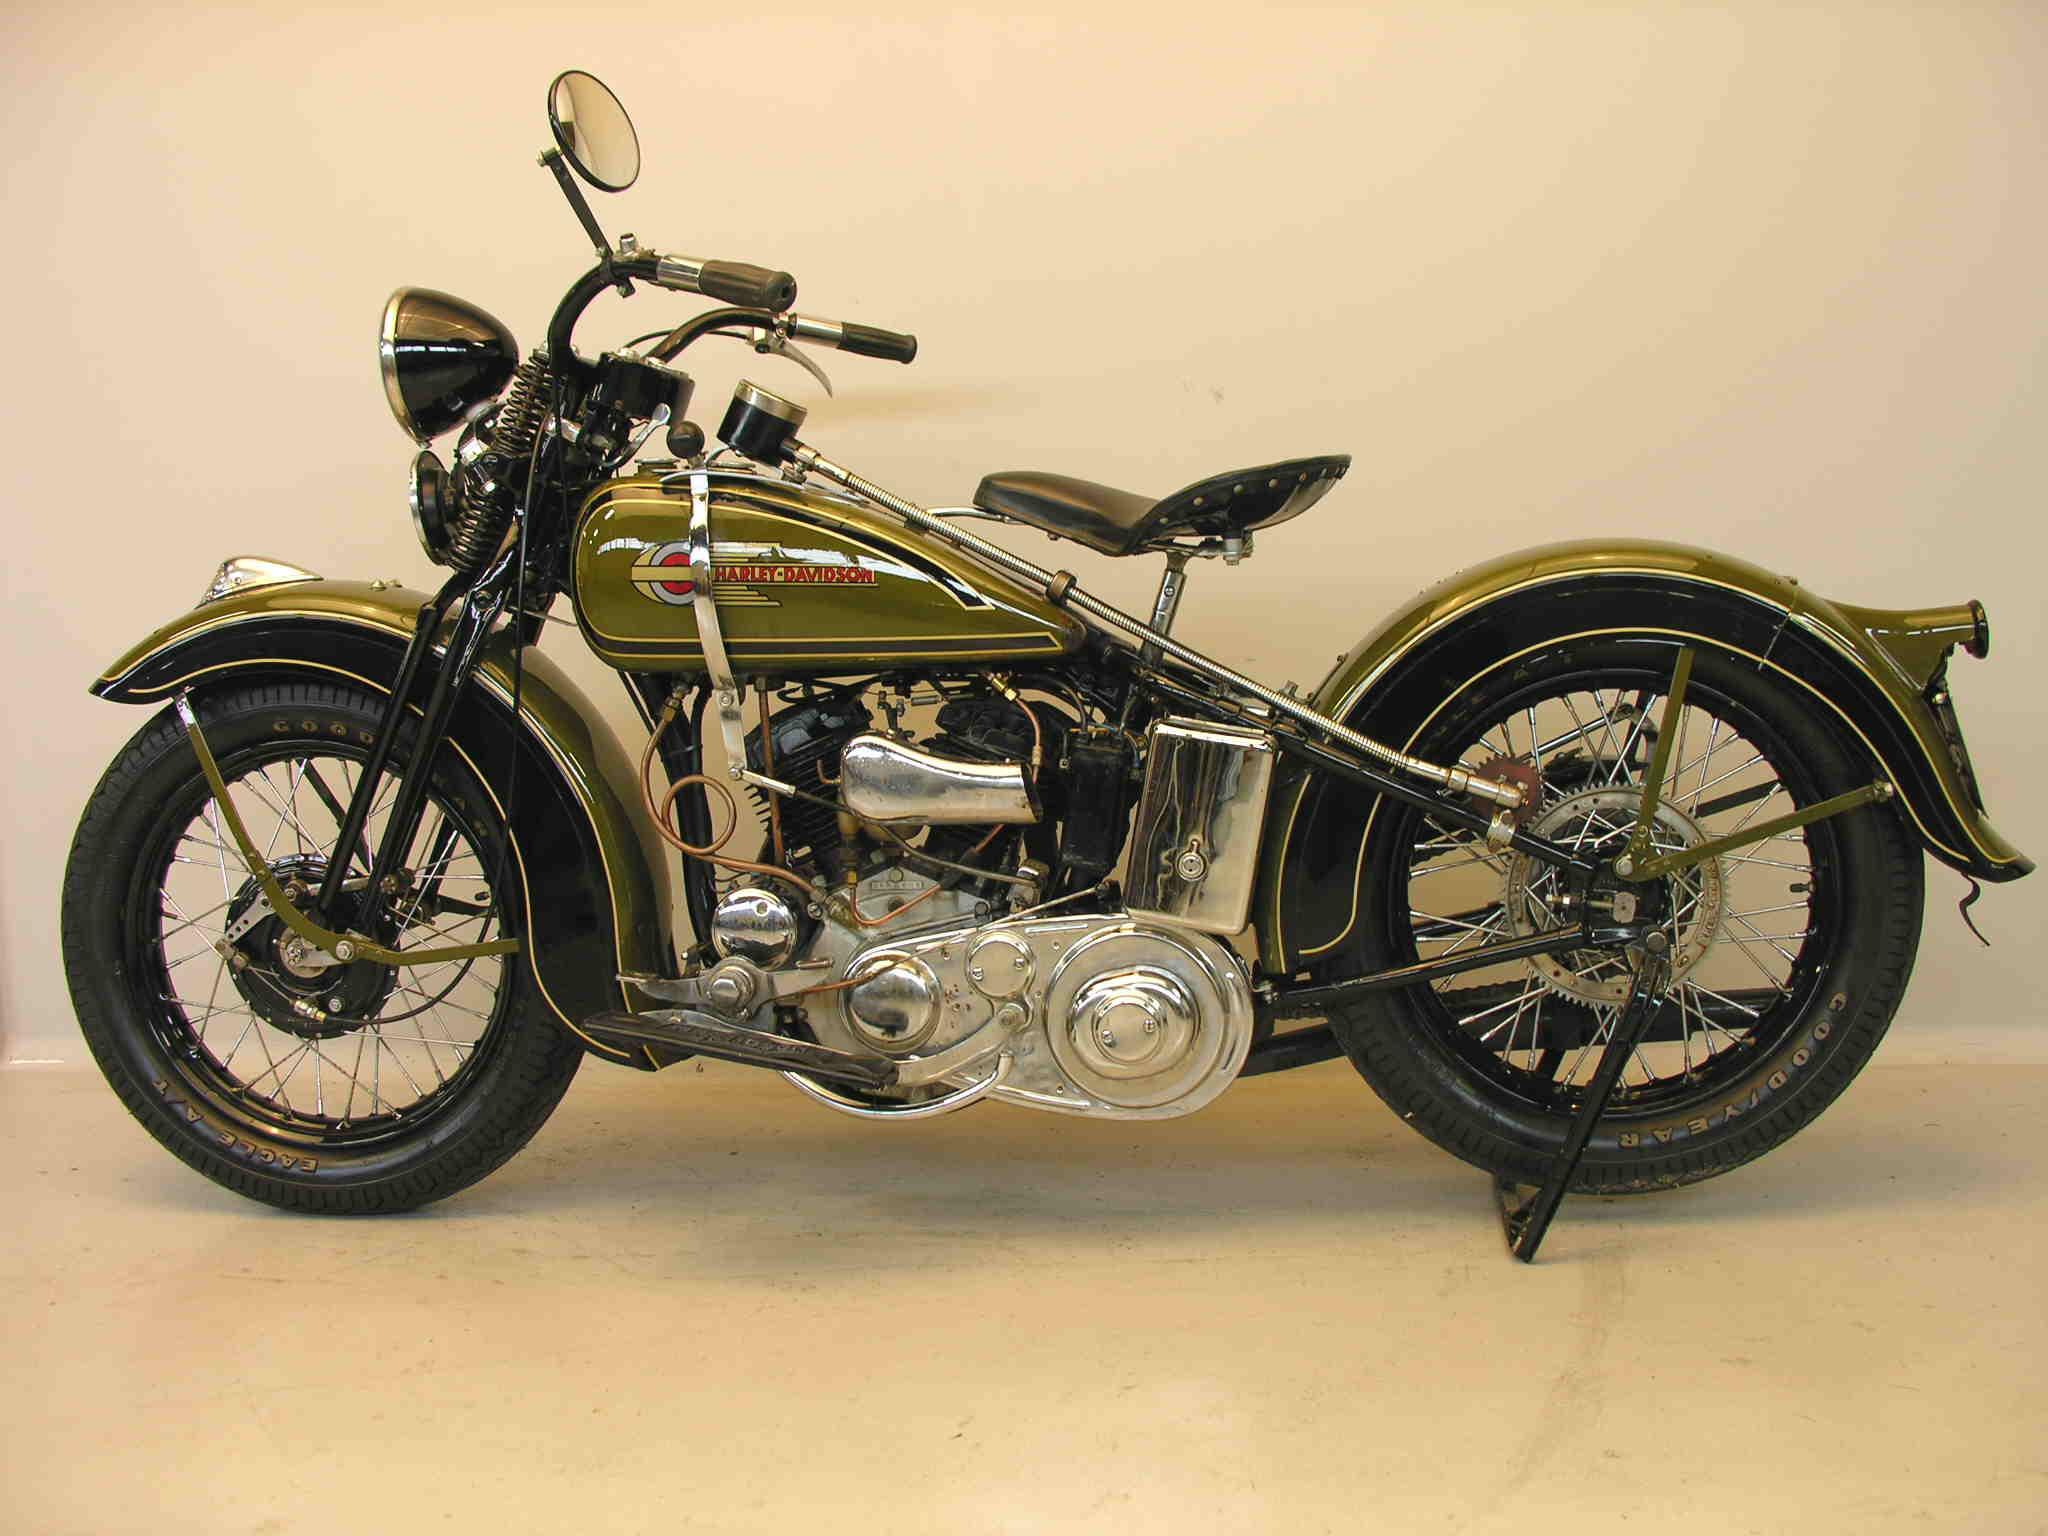 Harley Davidson: Harley Davidson 1936 36R 750 Cc 2 Cyl Sv